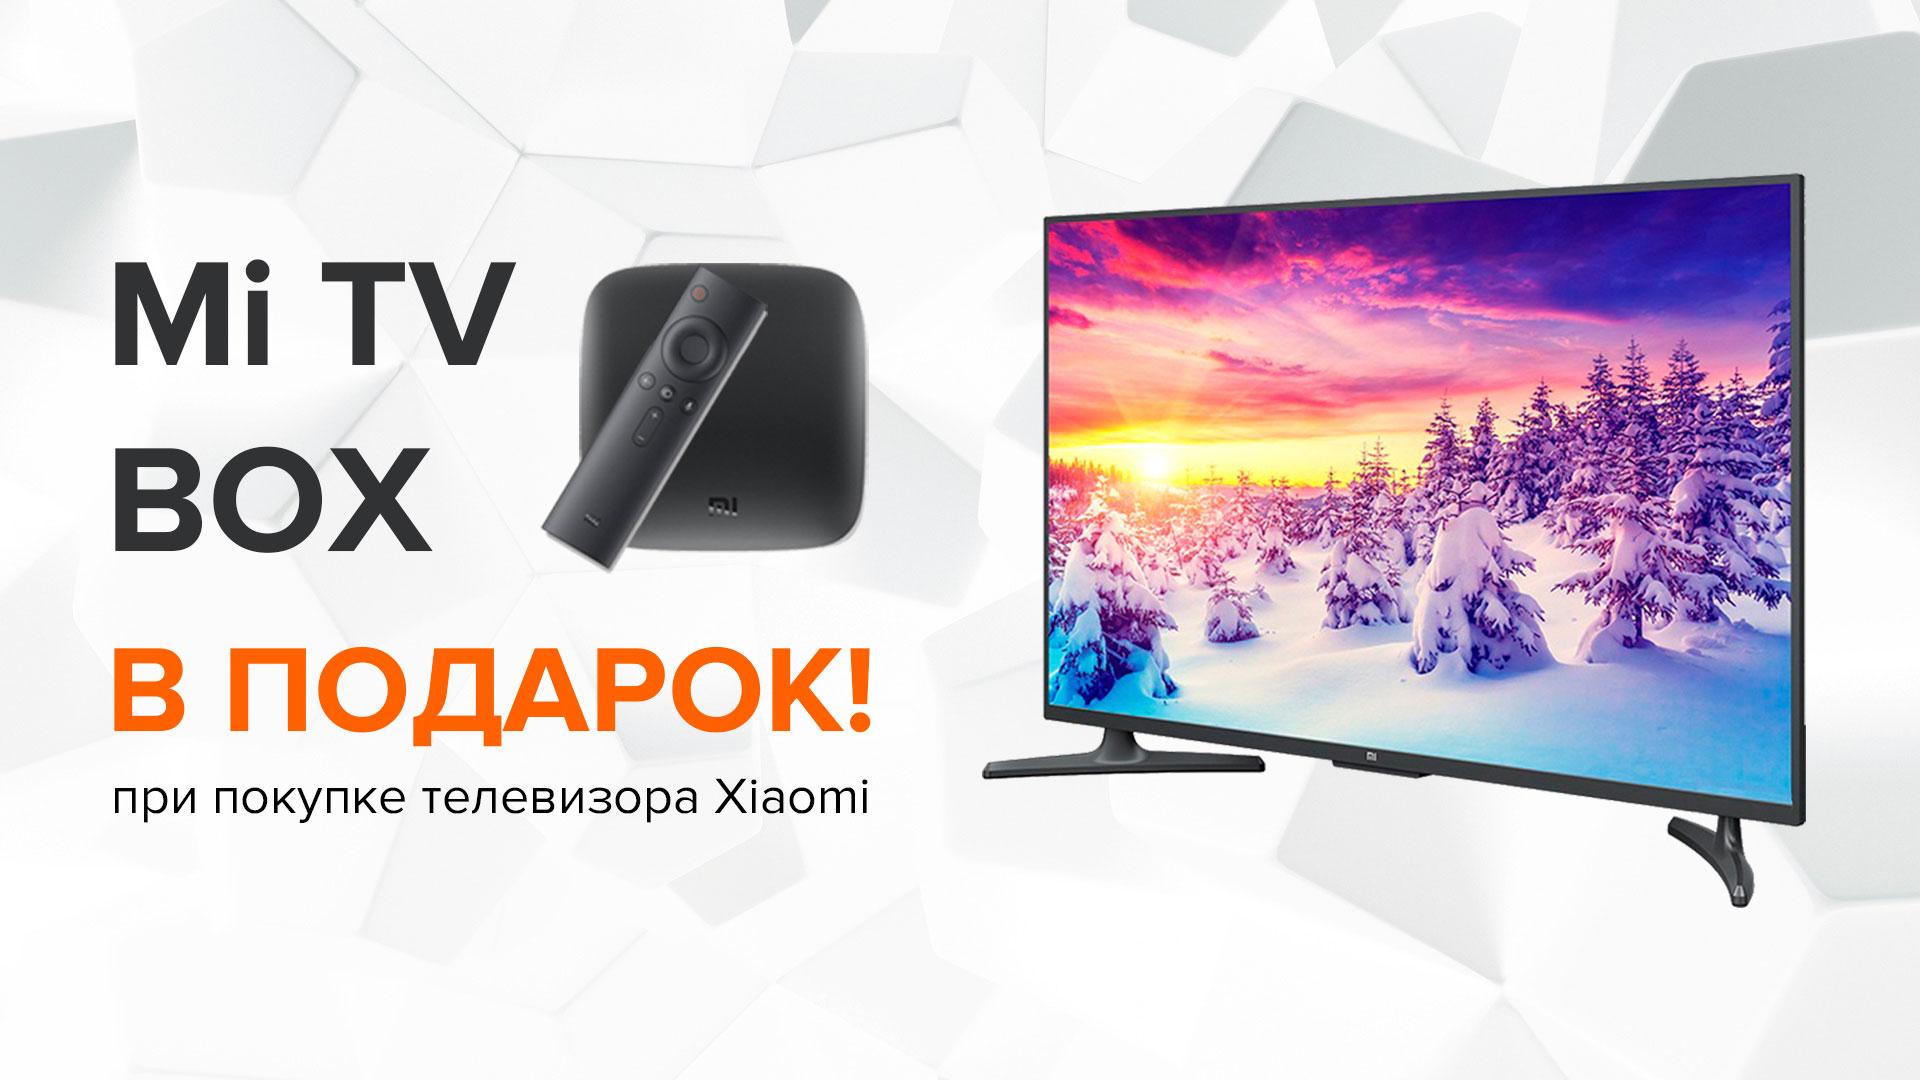 Mi TV Box в подарок при покупке телевизора Xiaomi